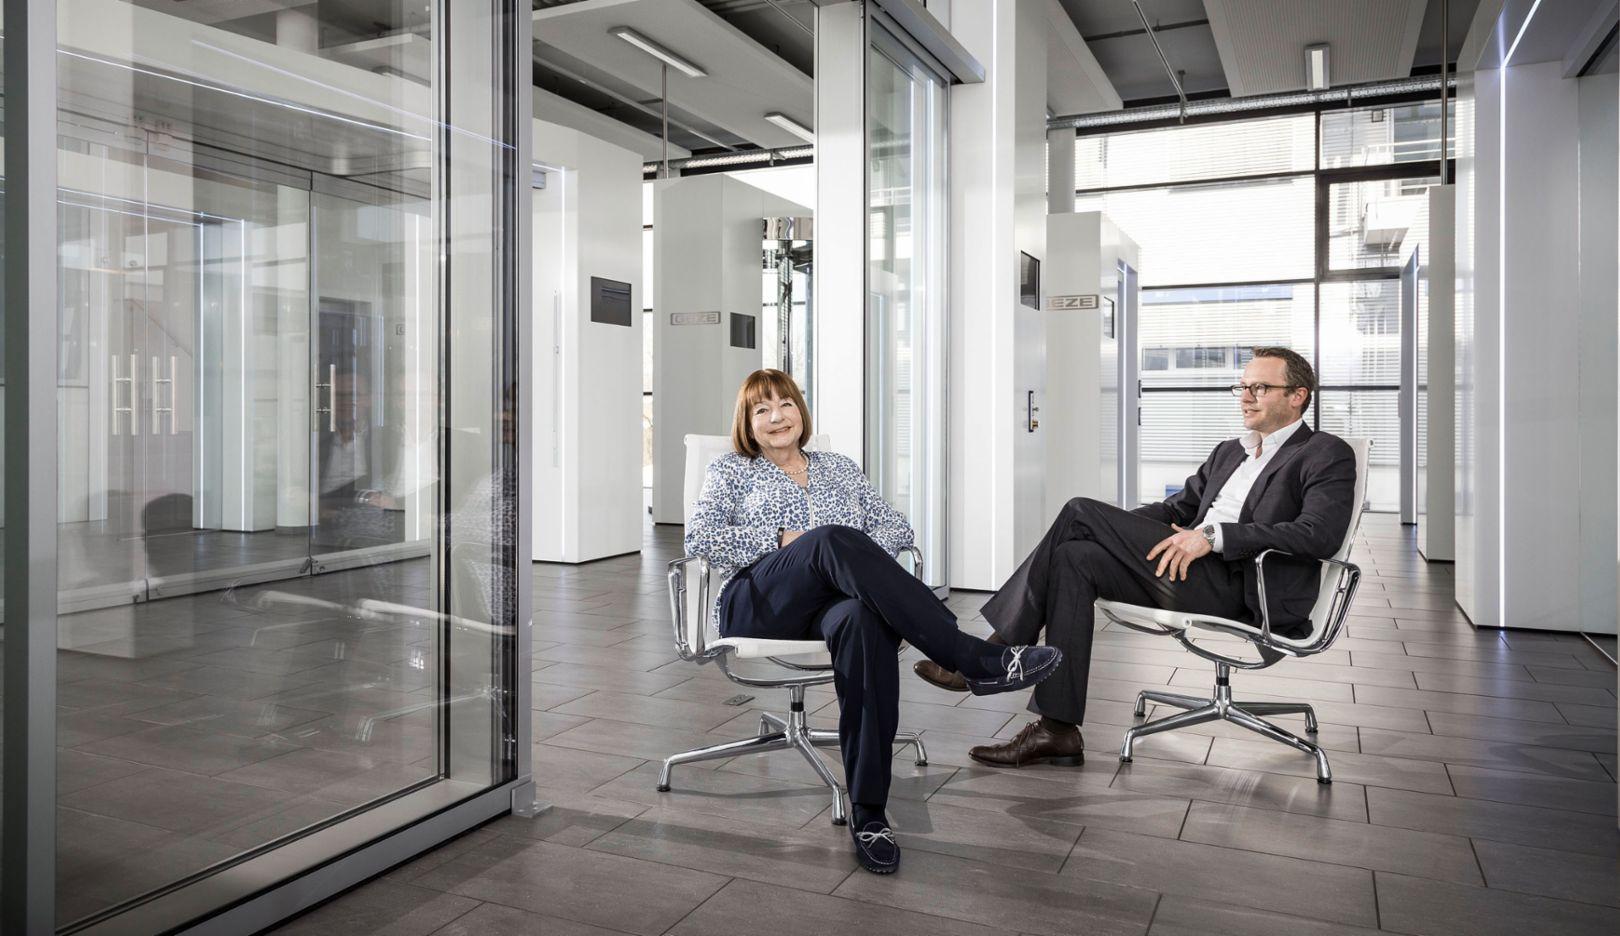 l-r Brigitte Vöster-Alber, Geze CEO, Marc Alber, 2016, Porsche Consulting GmbH